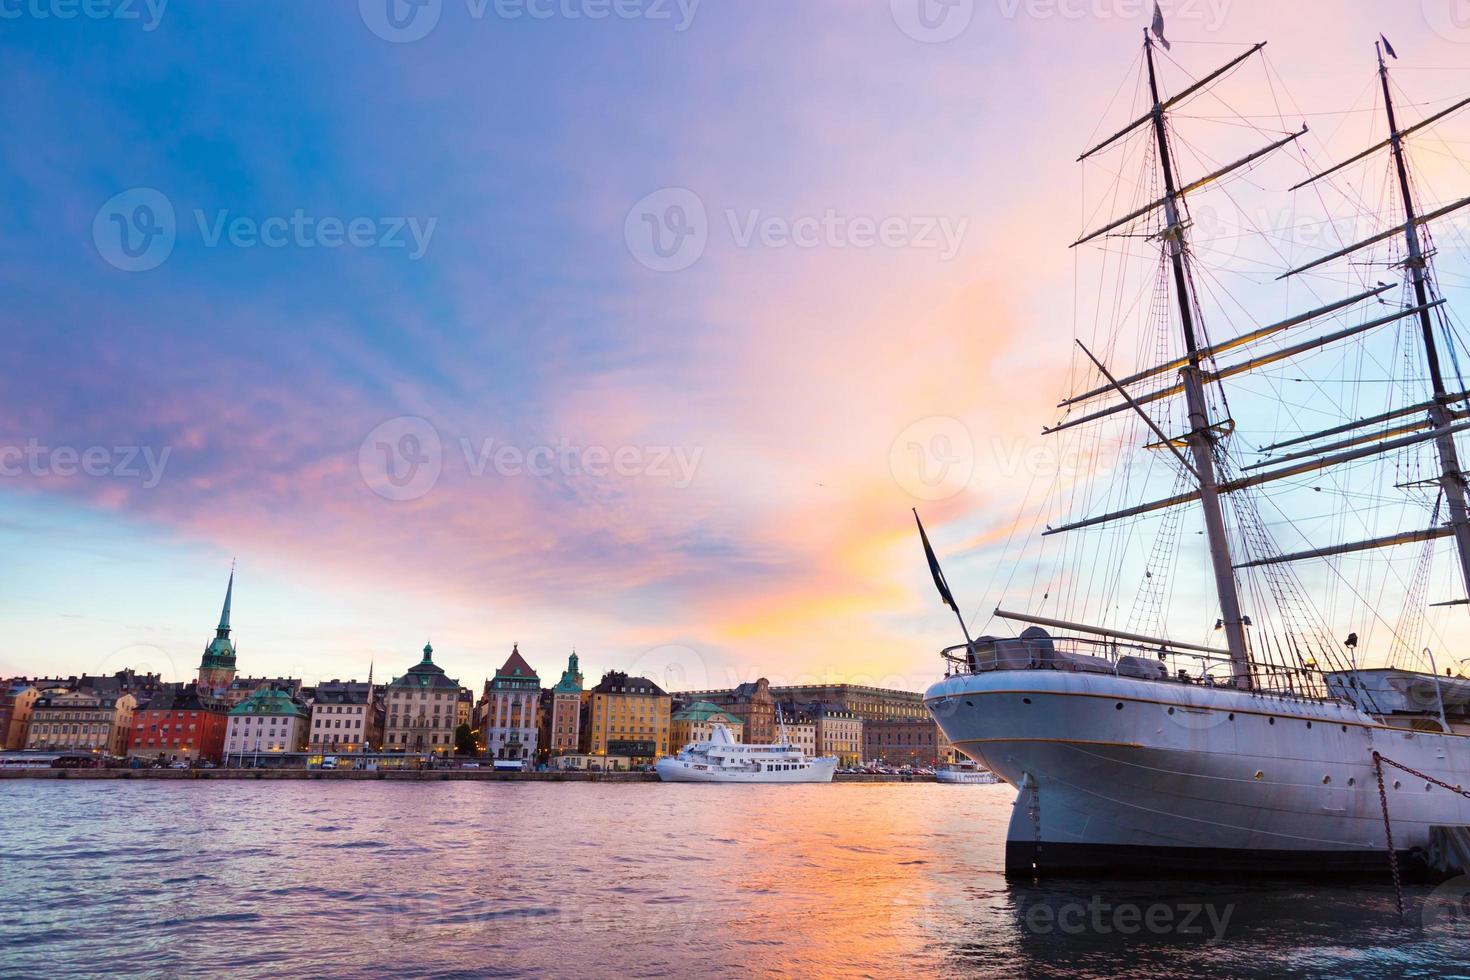 traditionelles seilboot in gamla stan, stockholm, schweden, europa. foto